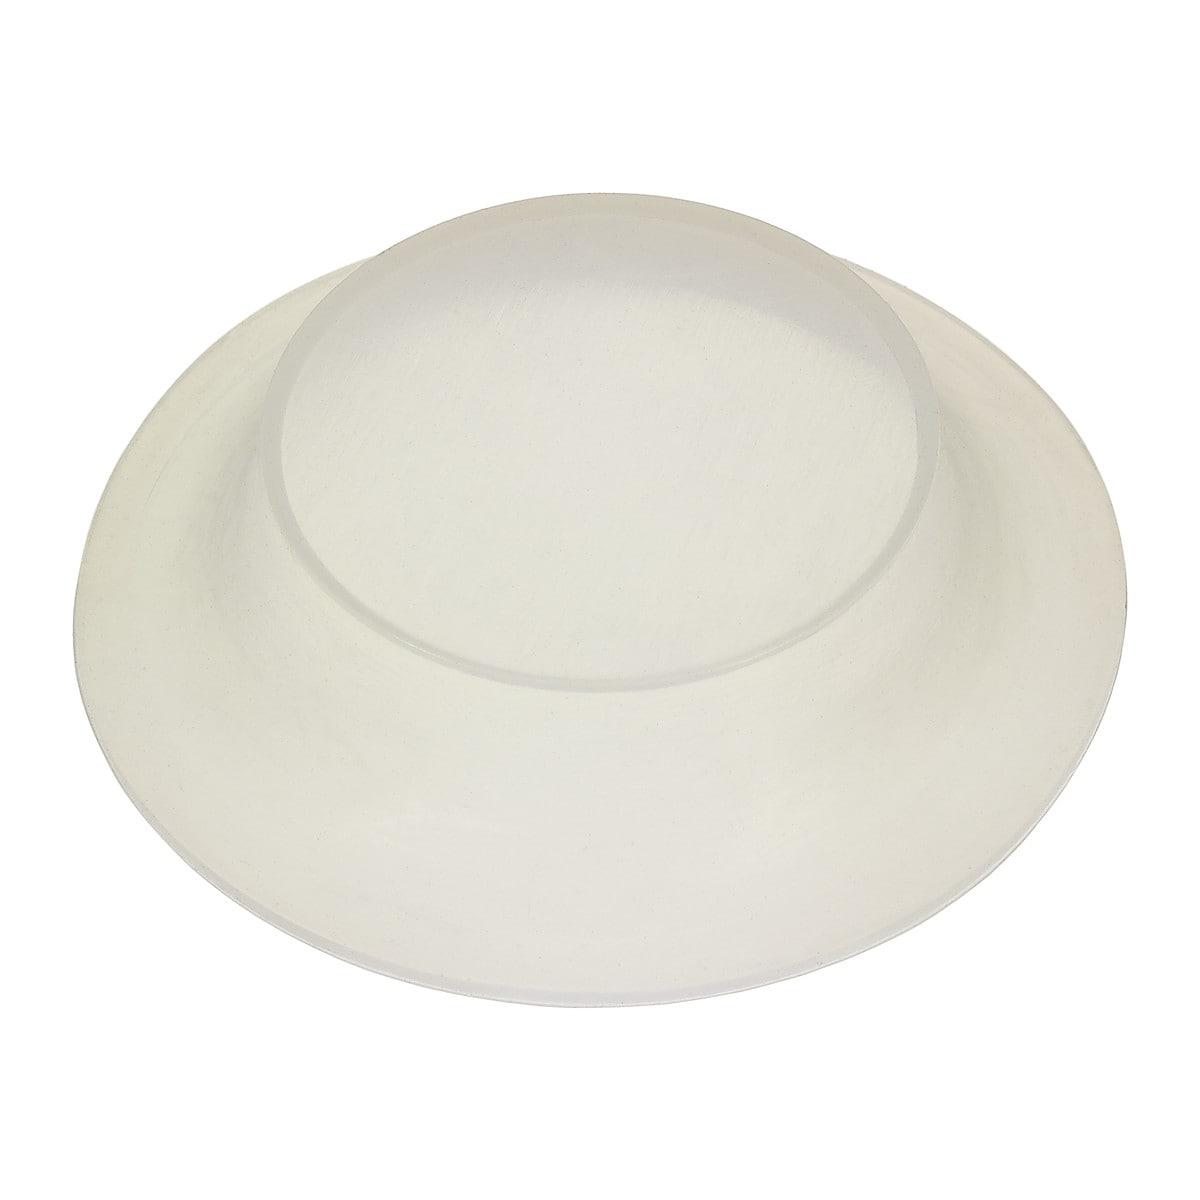 Seal for glass bottle 54 mm